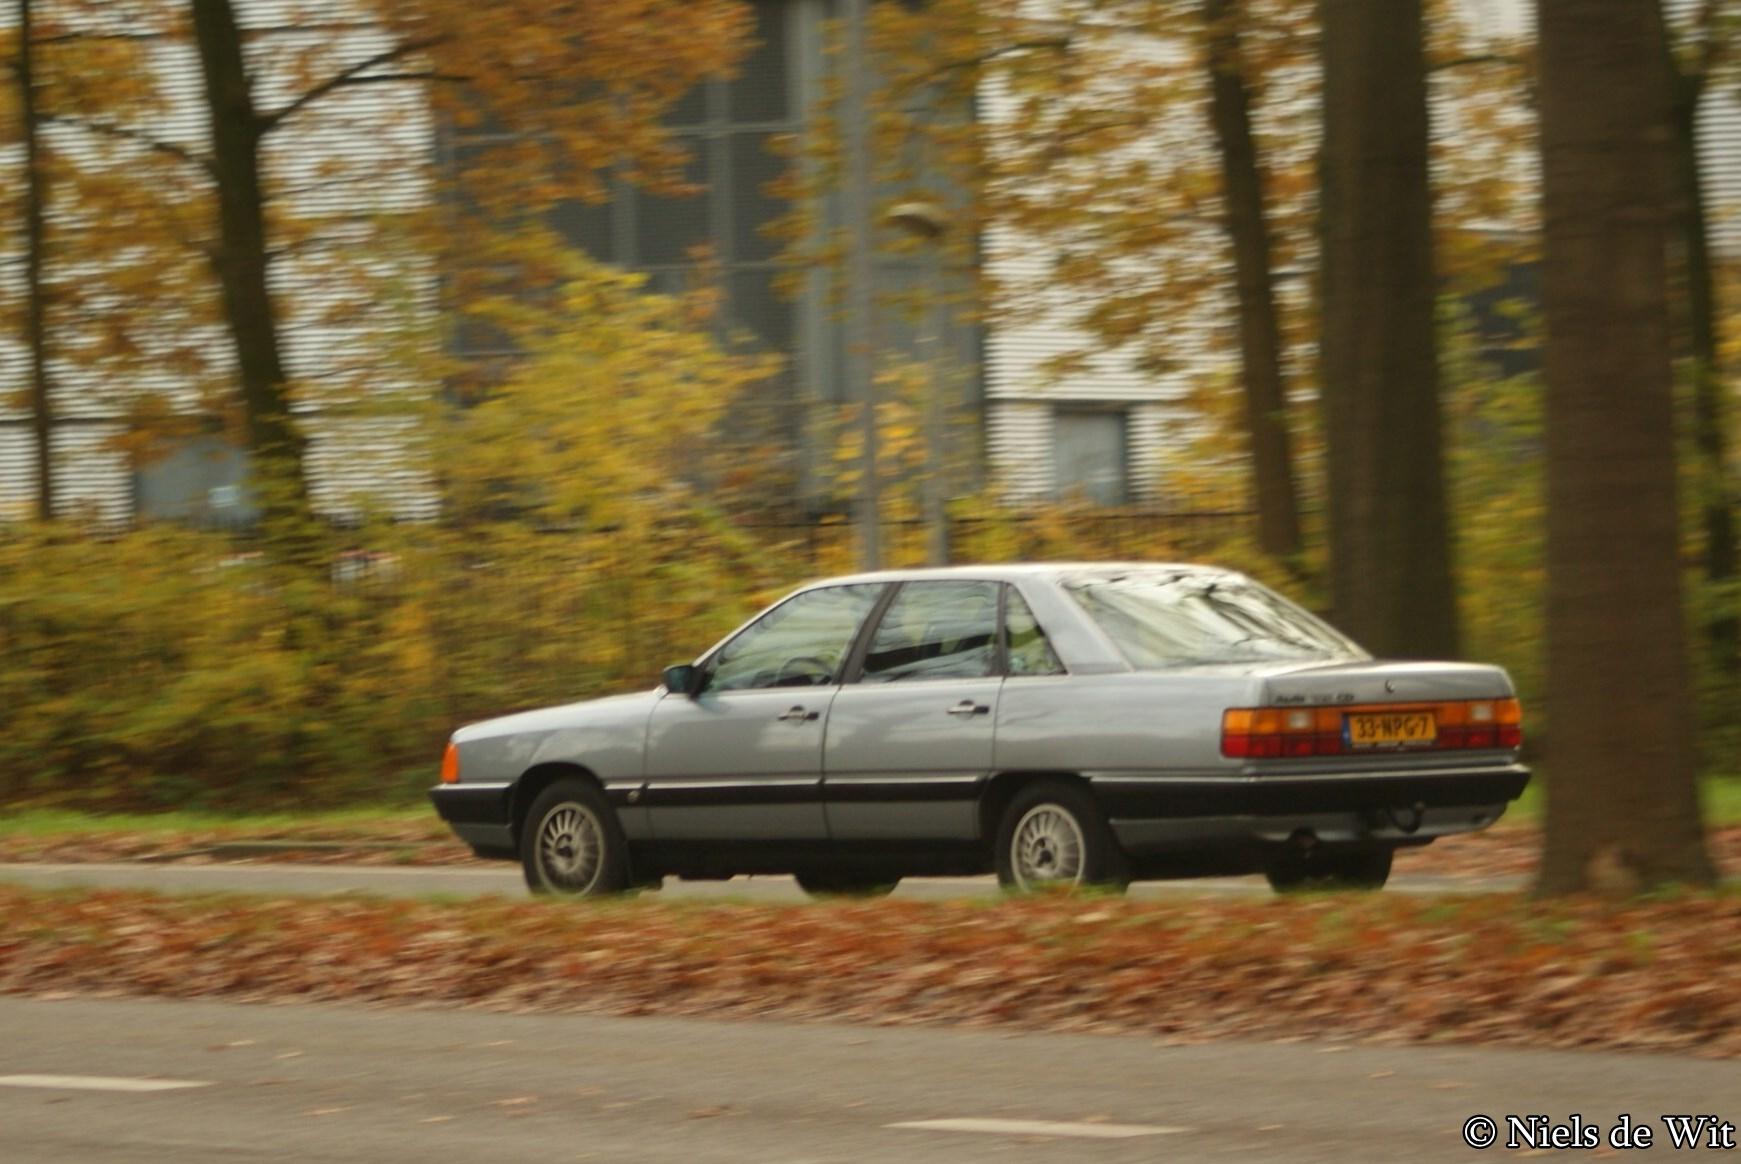 File:1986 Audi 100 CD (10962681645).jpg - Wikimedia Commons